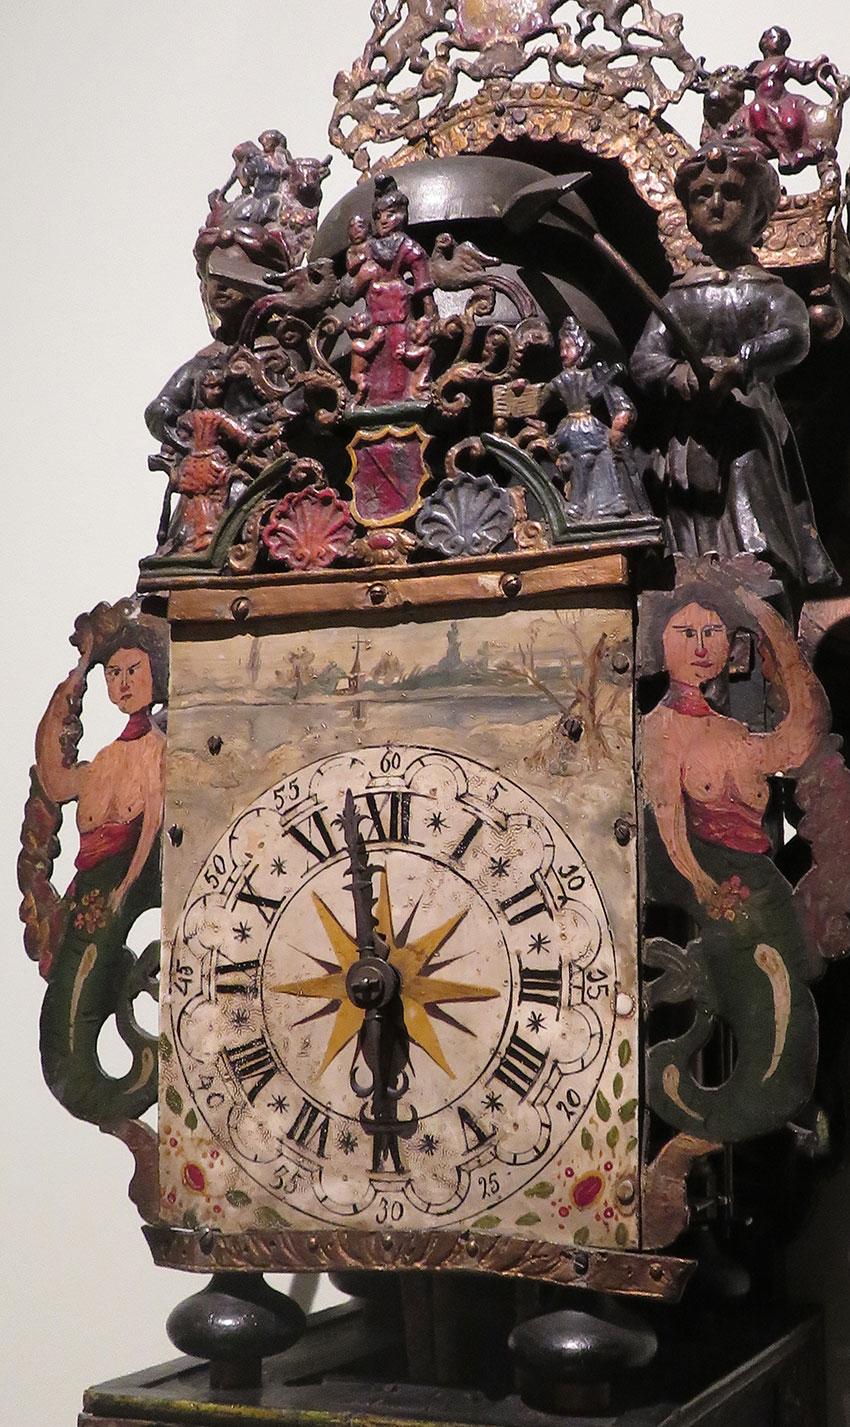 13_Reloj de pared autómata en hierro y madera policromada. Holandés. Siglo XVIII.Medidas 70 x 30 cm.Nº Inv. R.A. 065